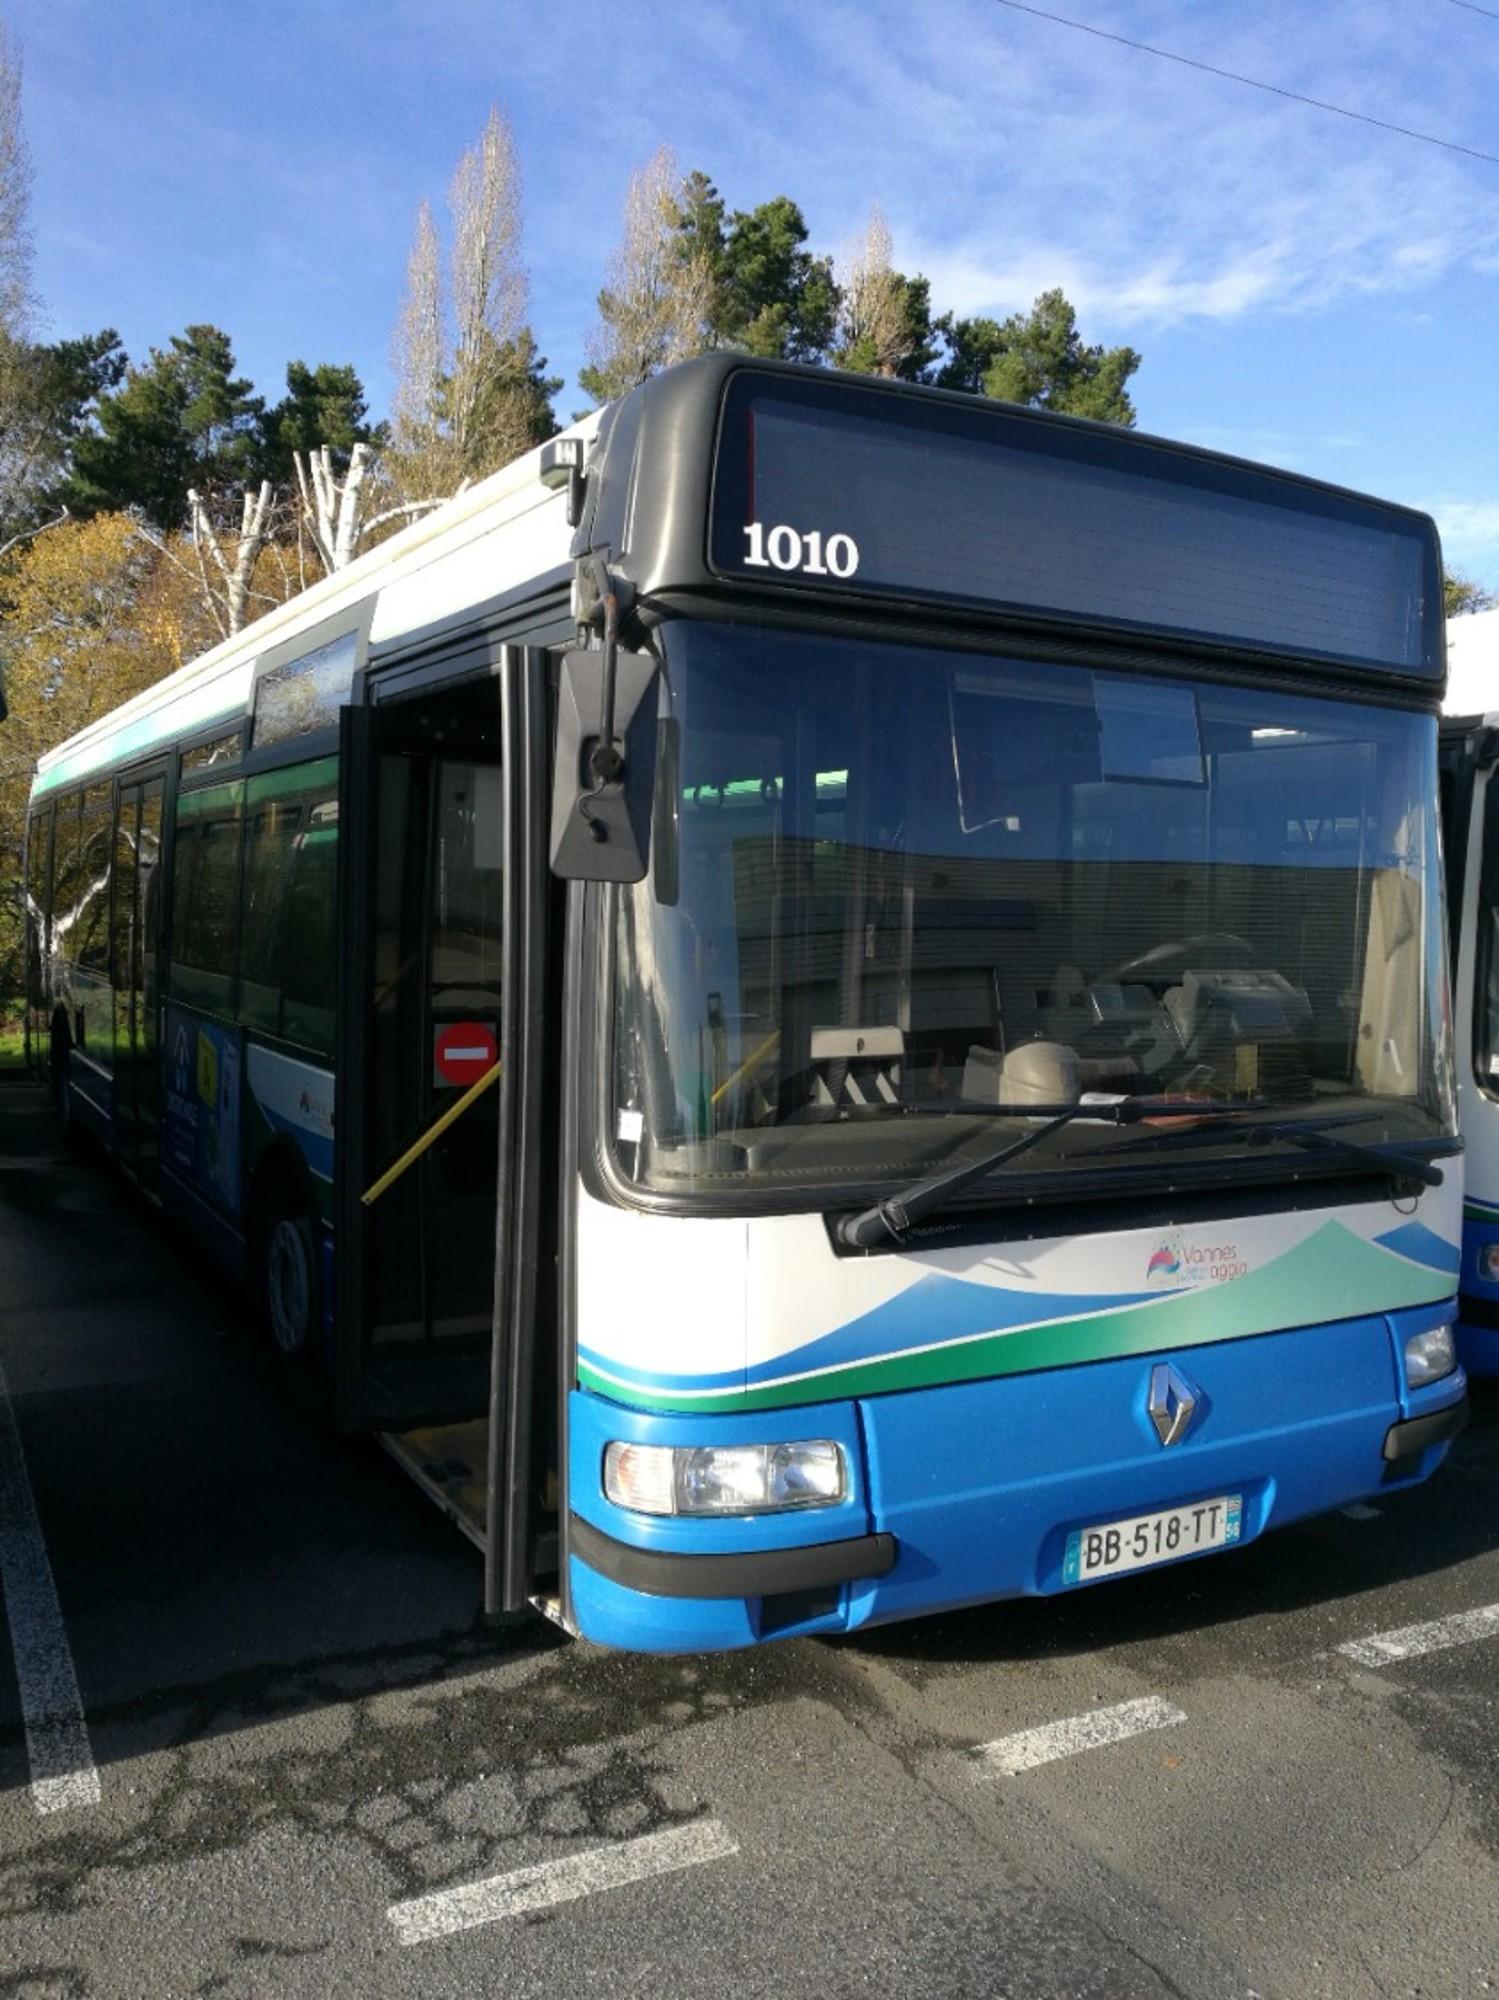 renault agora s 1010 car bus d 39 occasion aux ench res agorastore. Black Bedroom Furniture Sets. Home Design Ideas